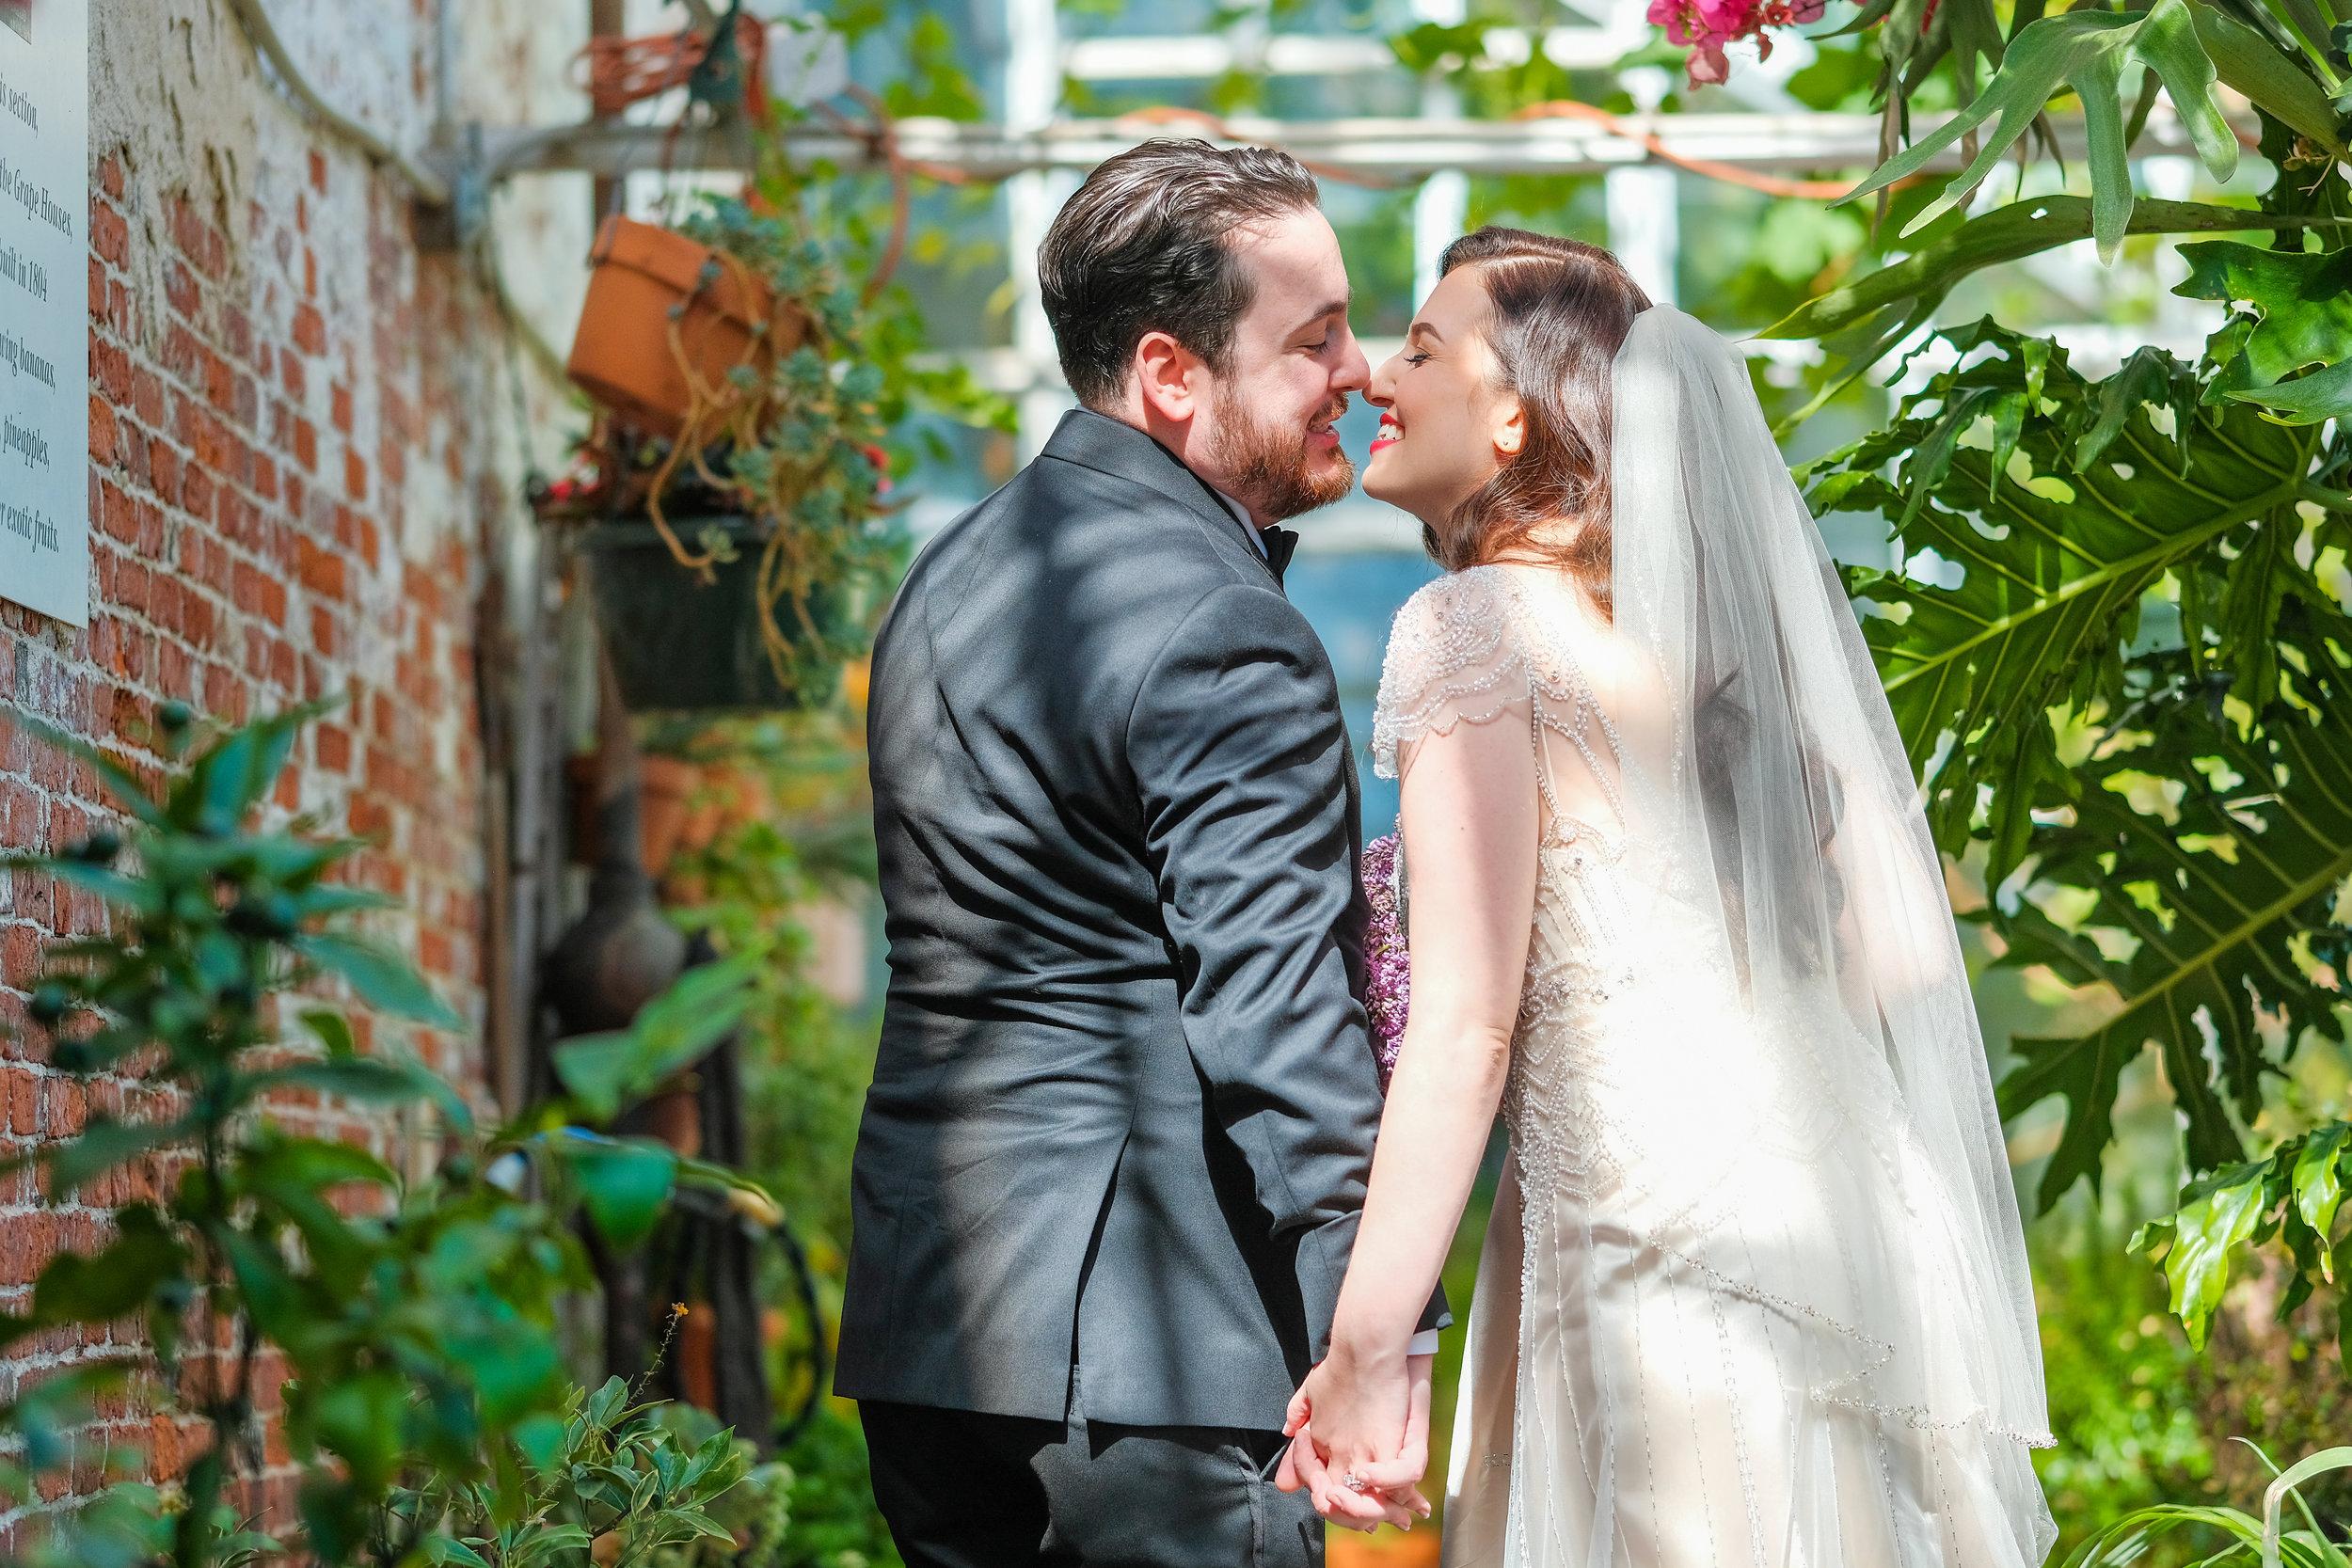 lyman-estate-wedding-photography-42.jpg